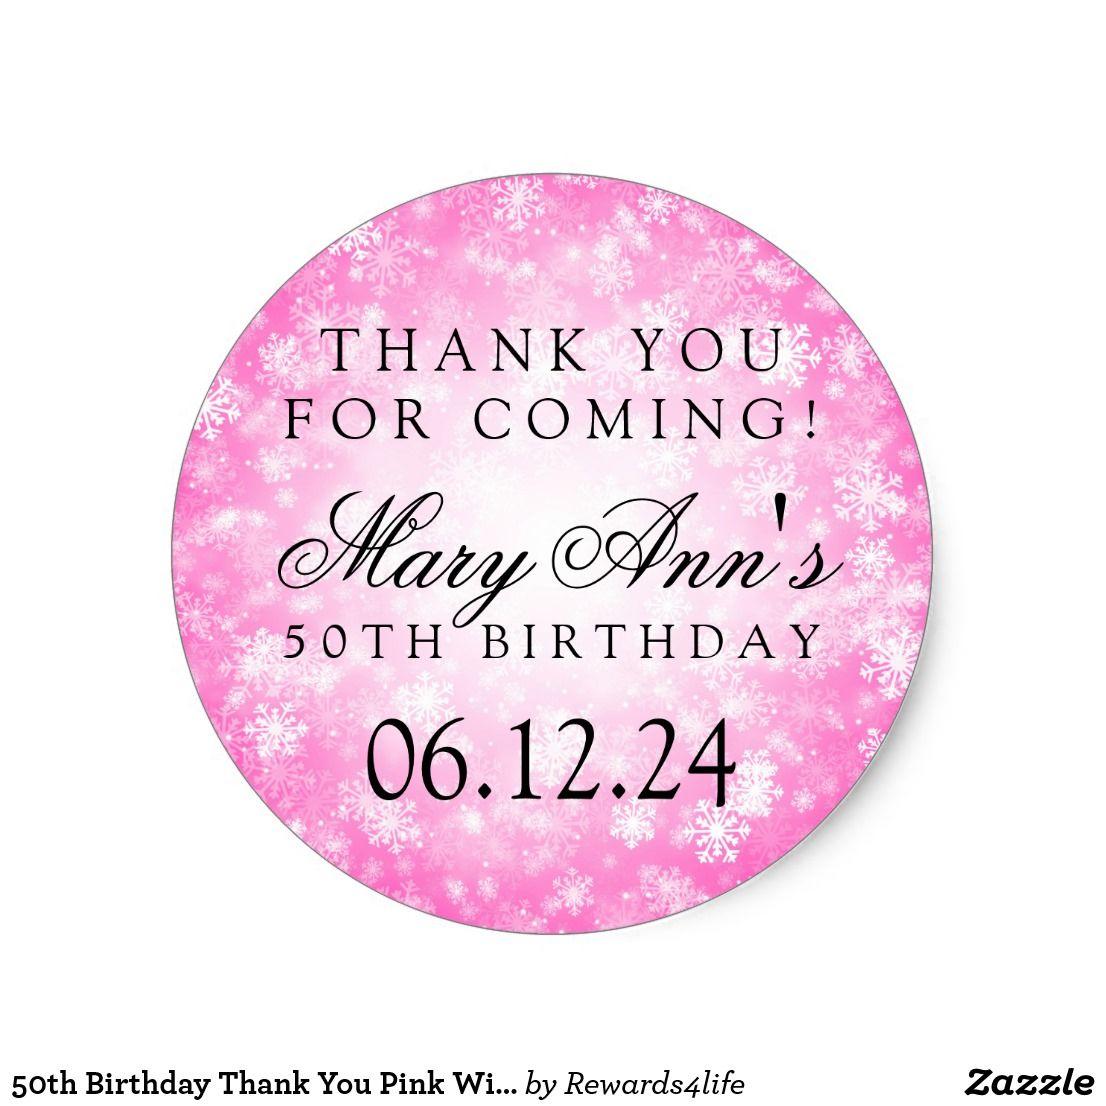 50th Birthday Thank You Pink Winter Wonderland Classic